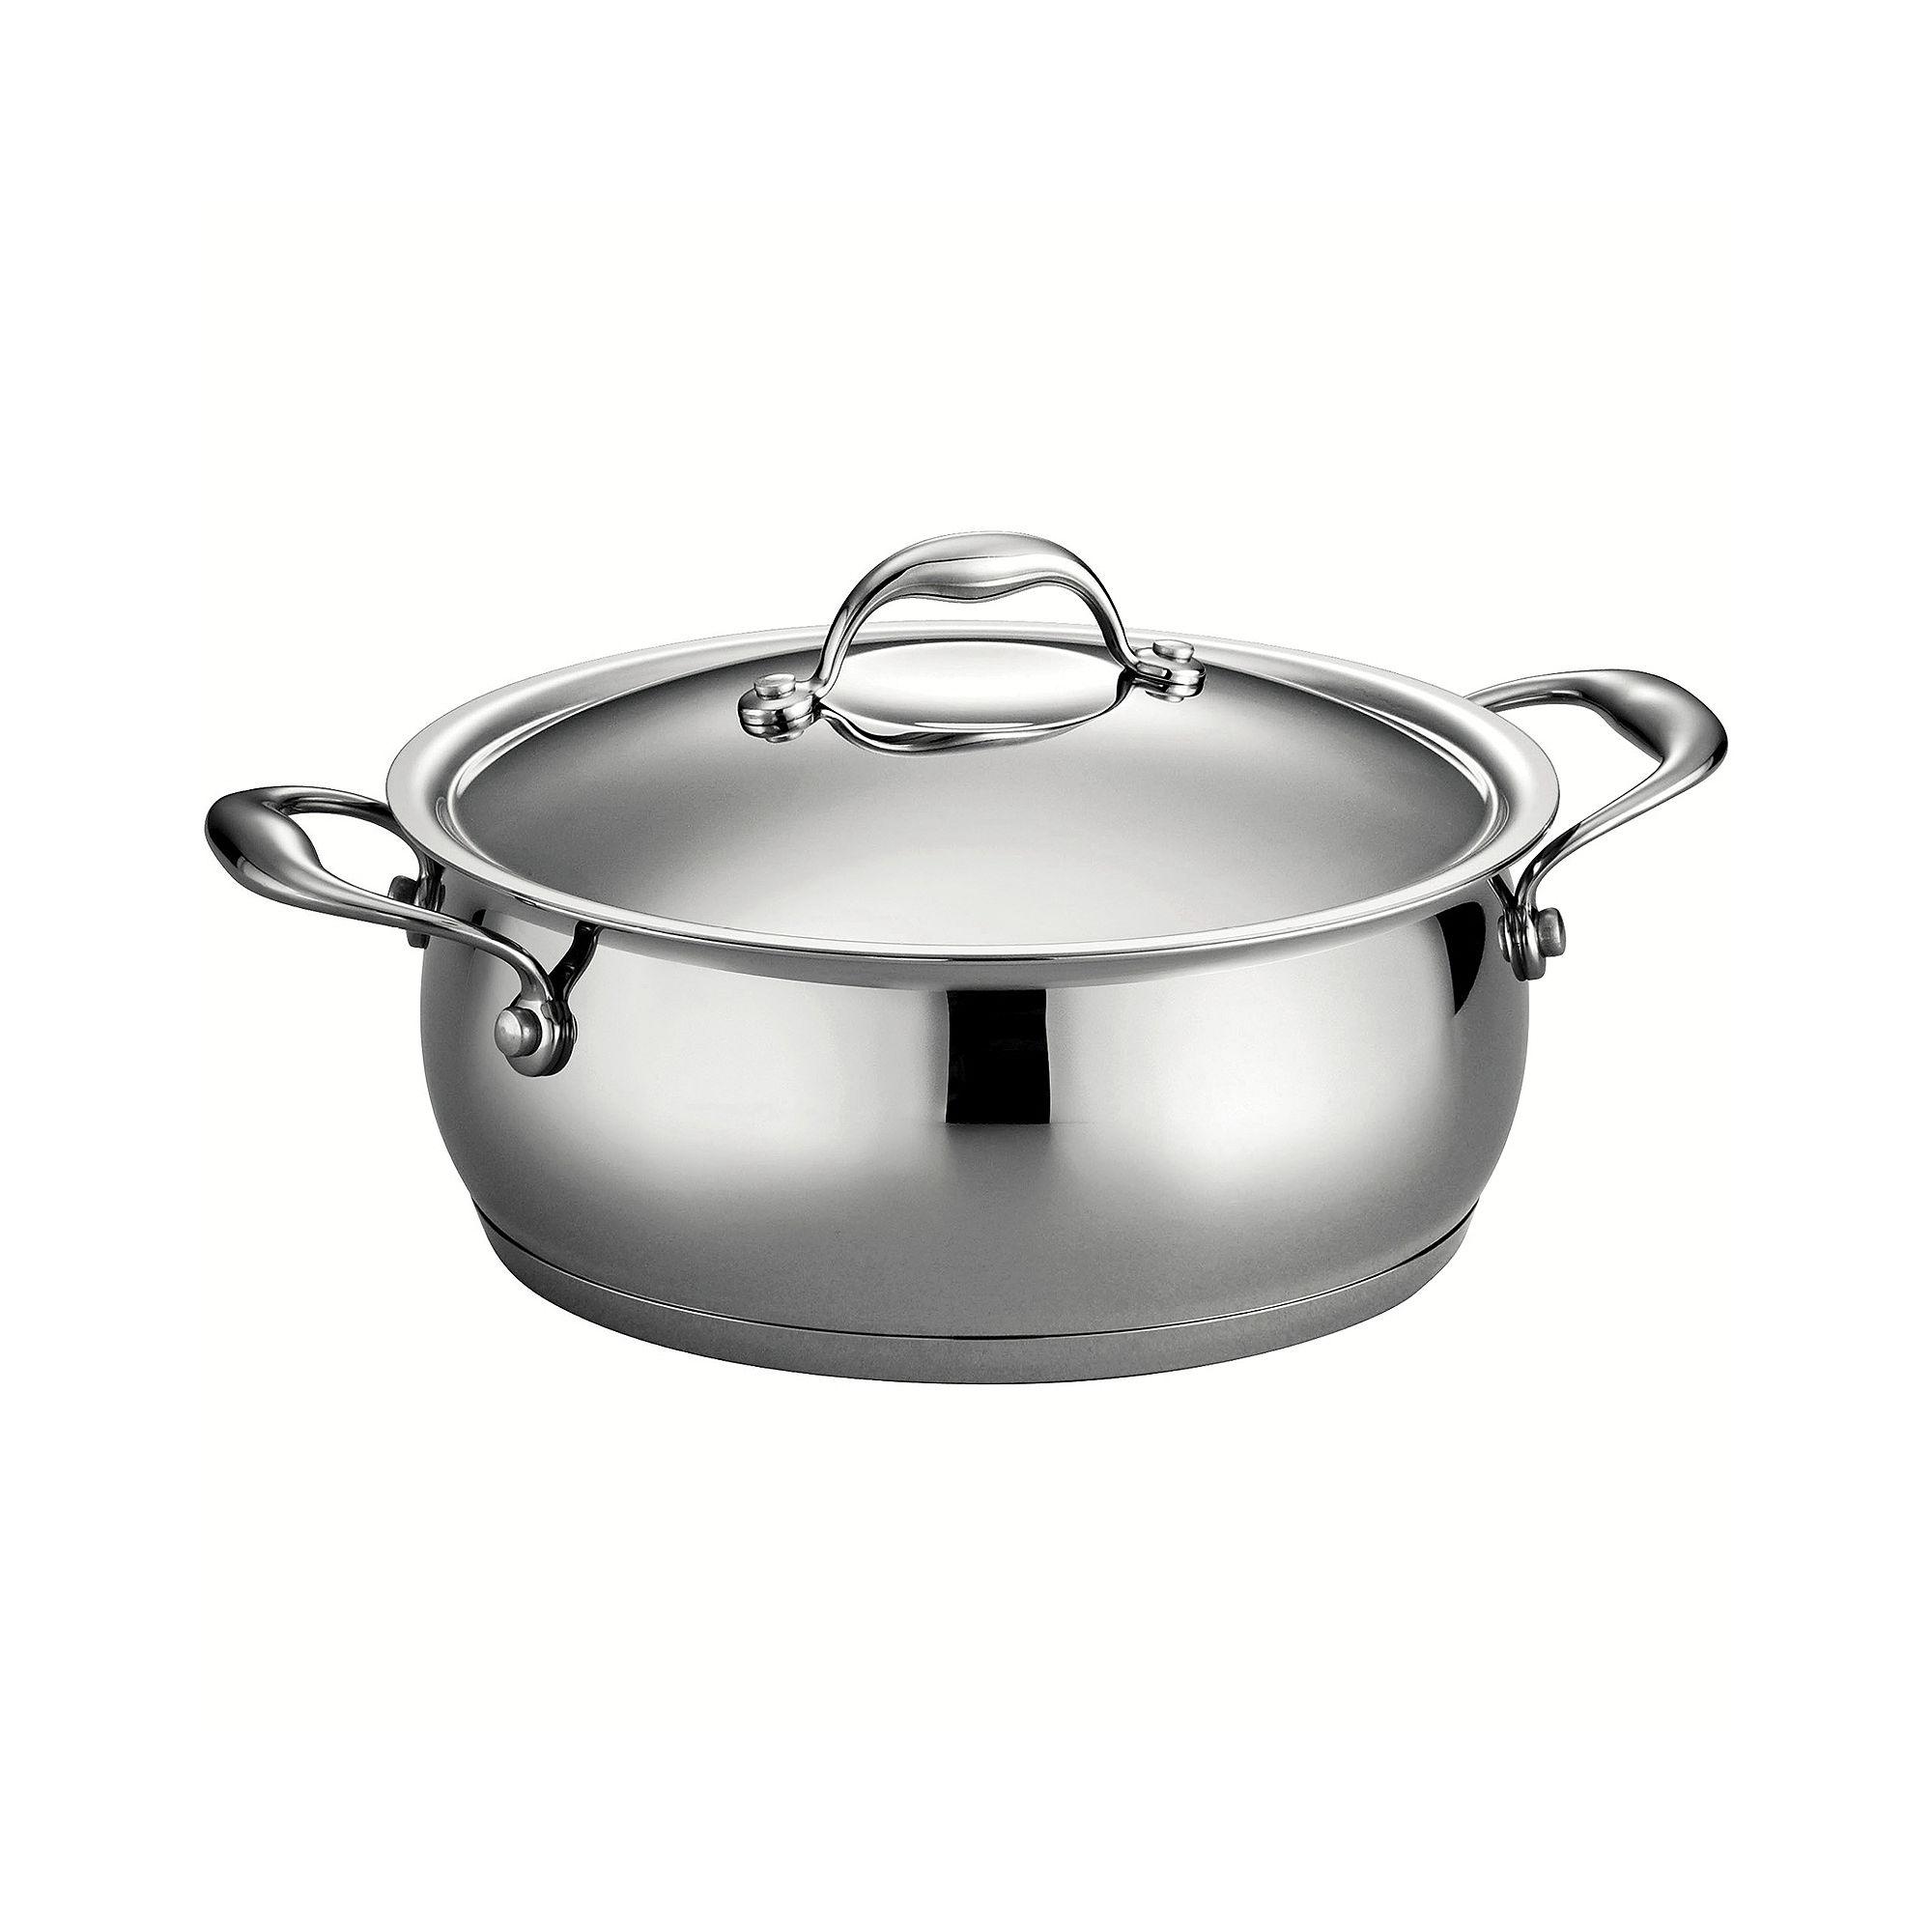 Deals Royal Cook Round Dutch Oven 13 Quart Limited